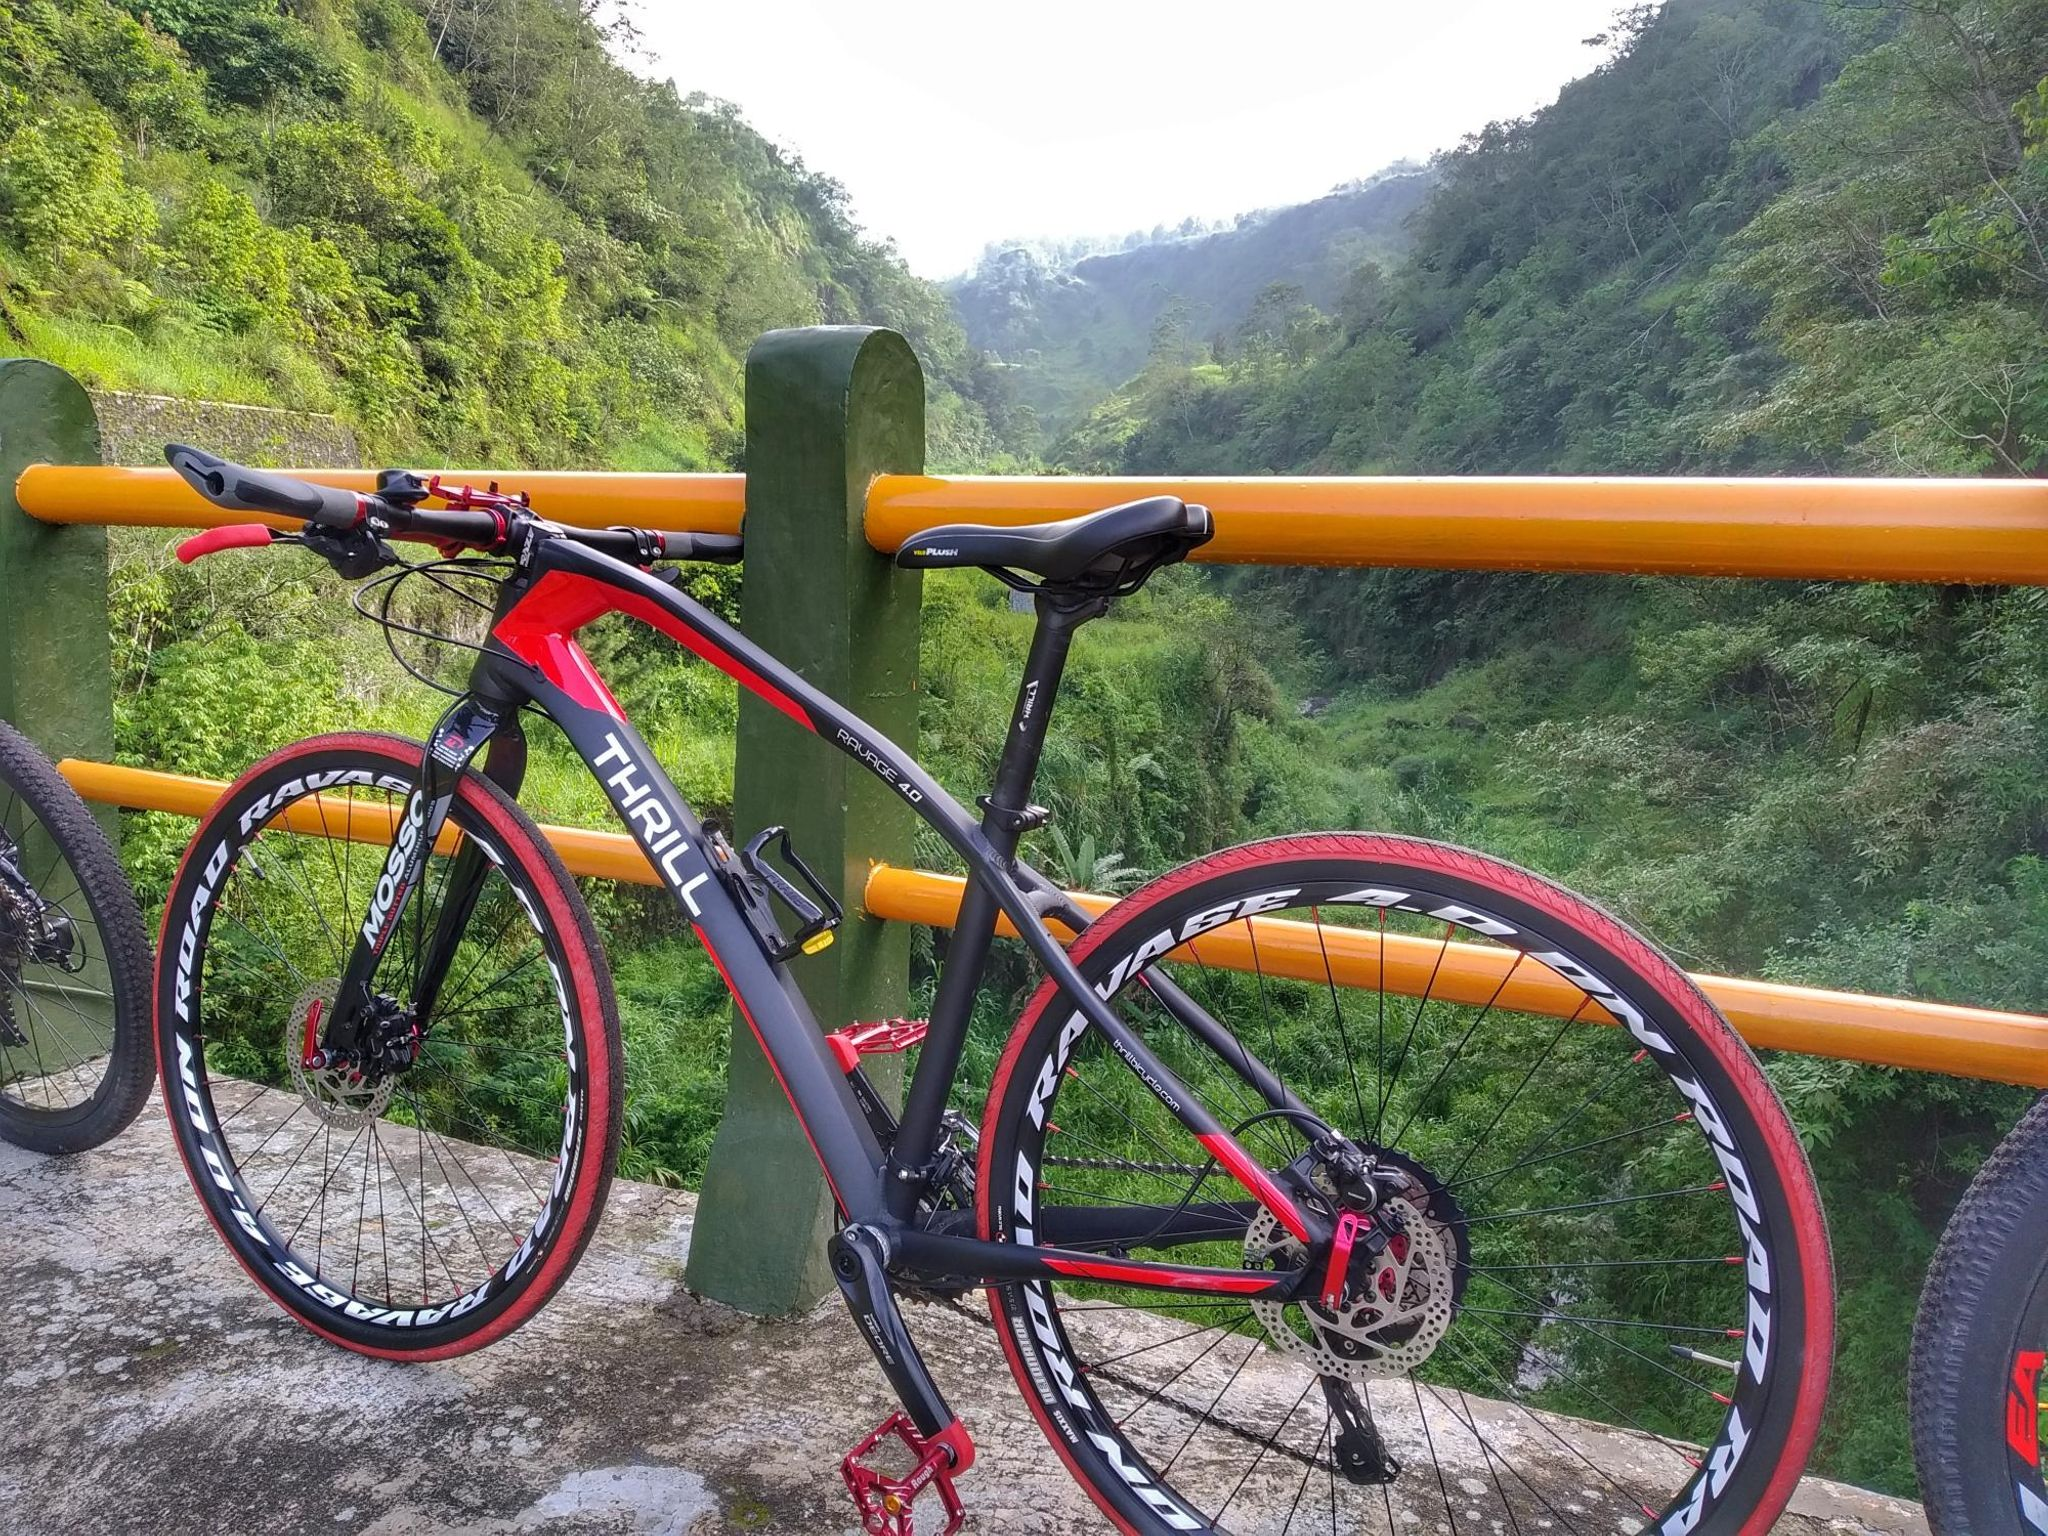 Merubah Sepeda MTB ke Sepeda Hybrid